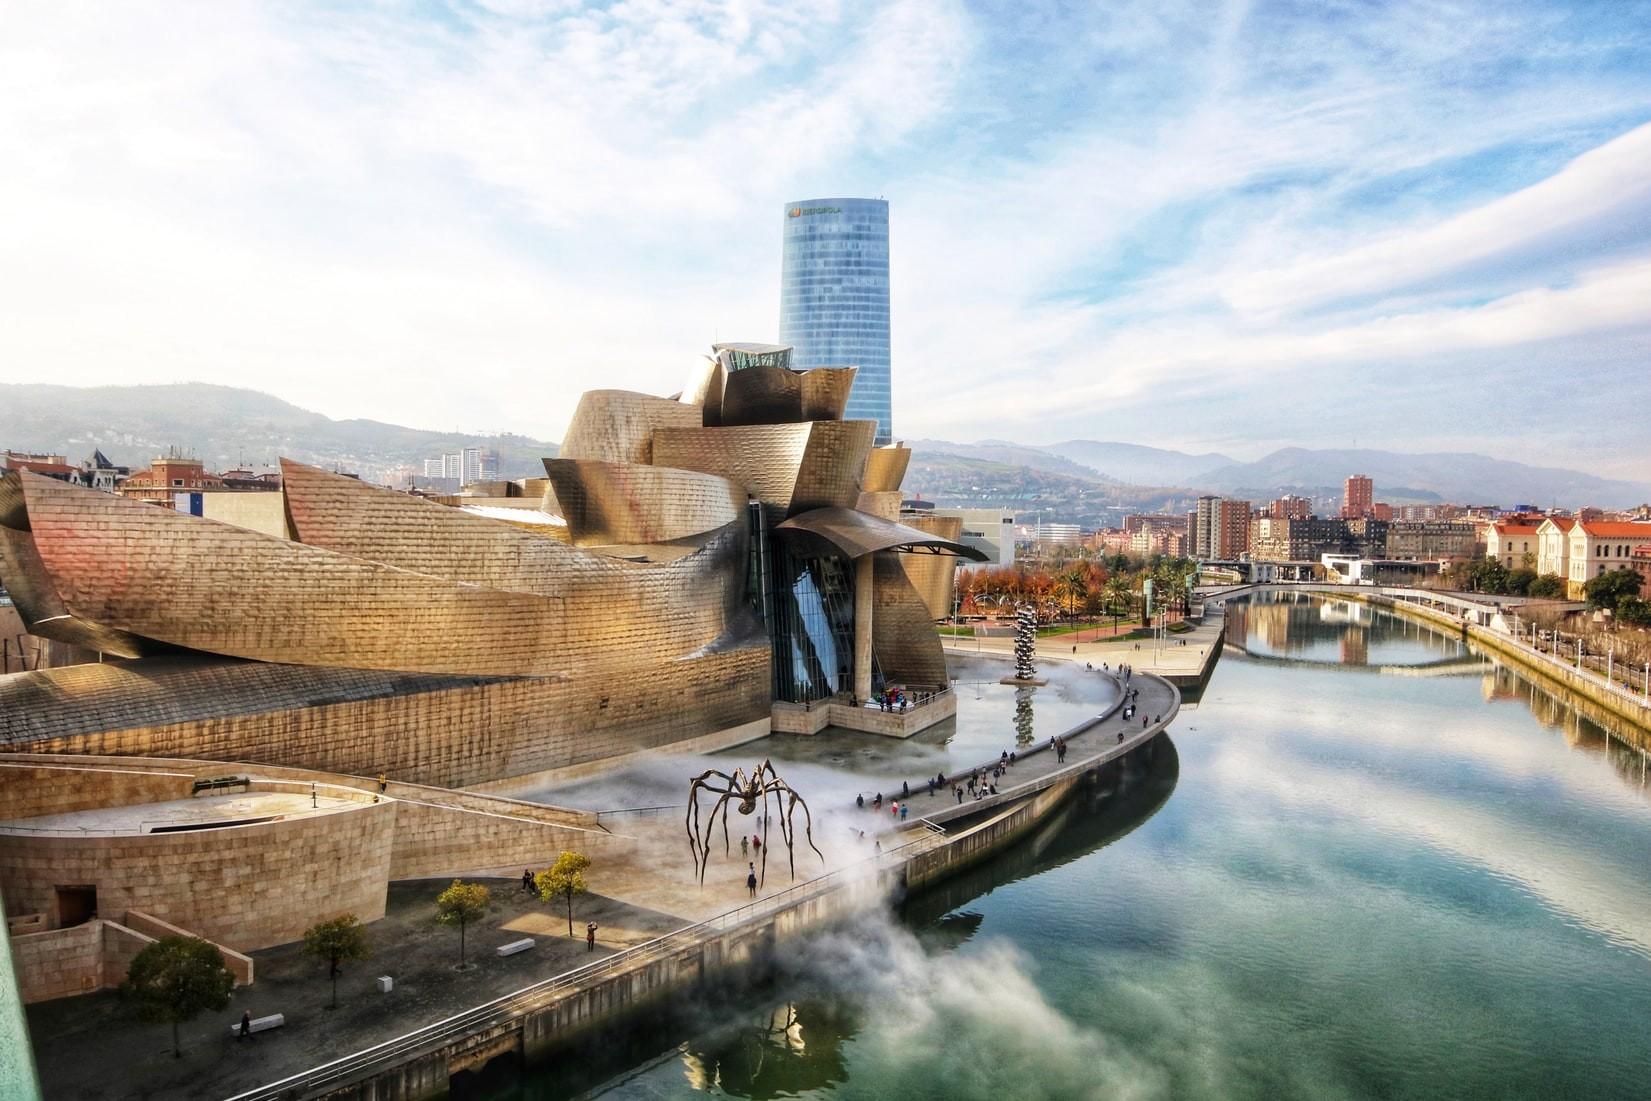 image of Guggenheim